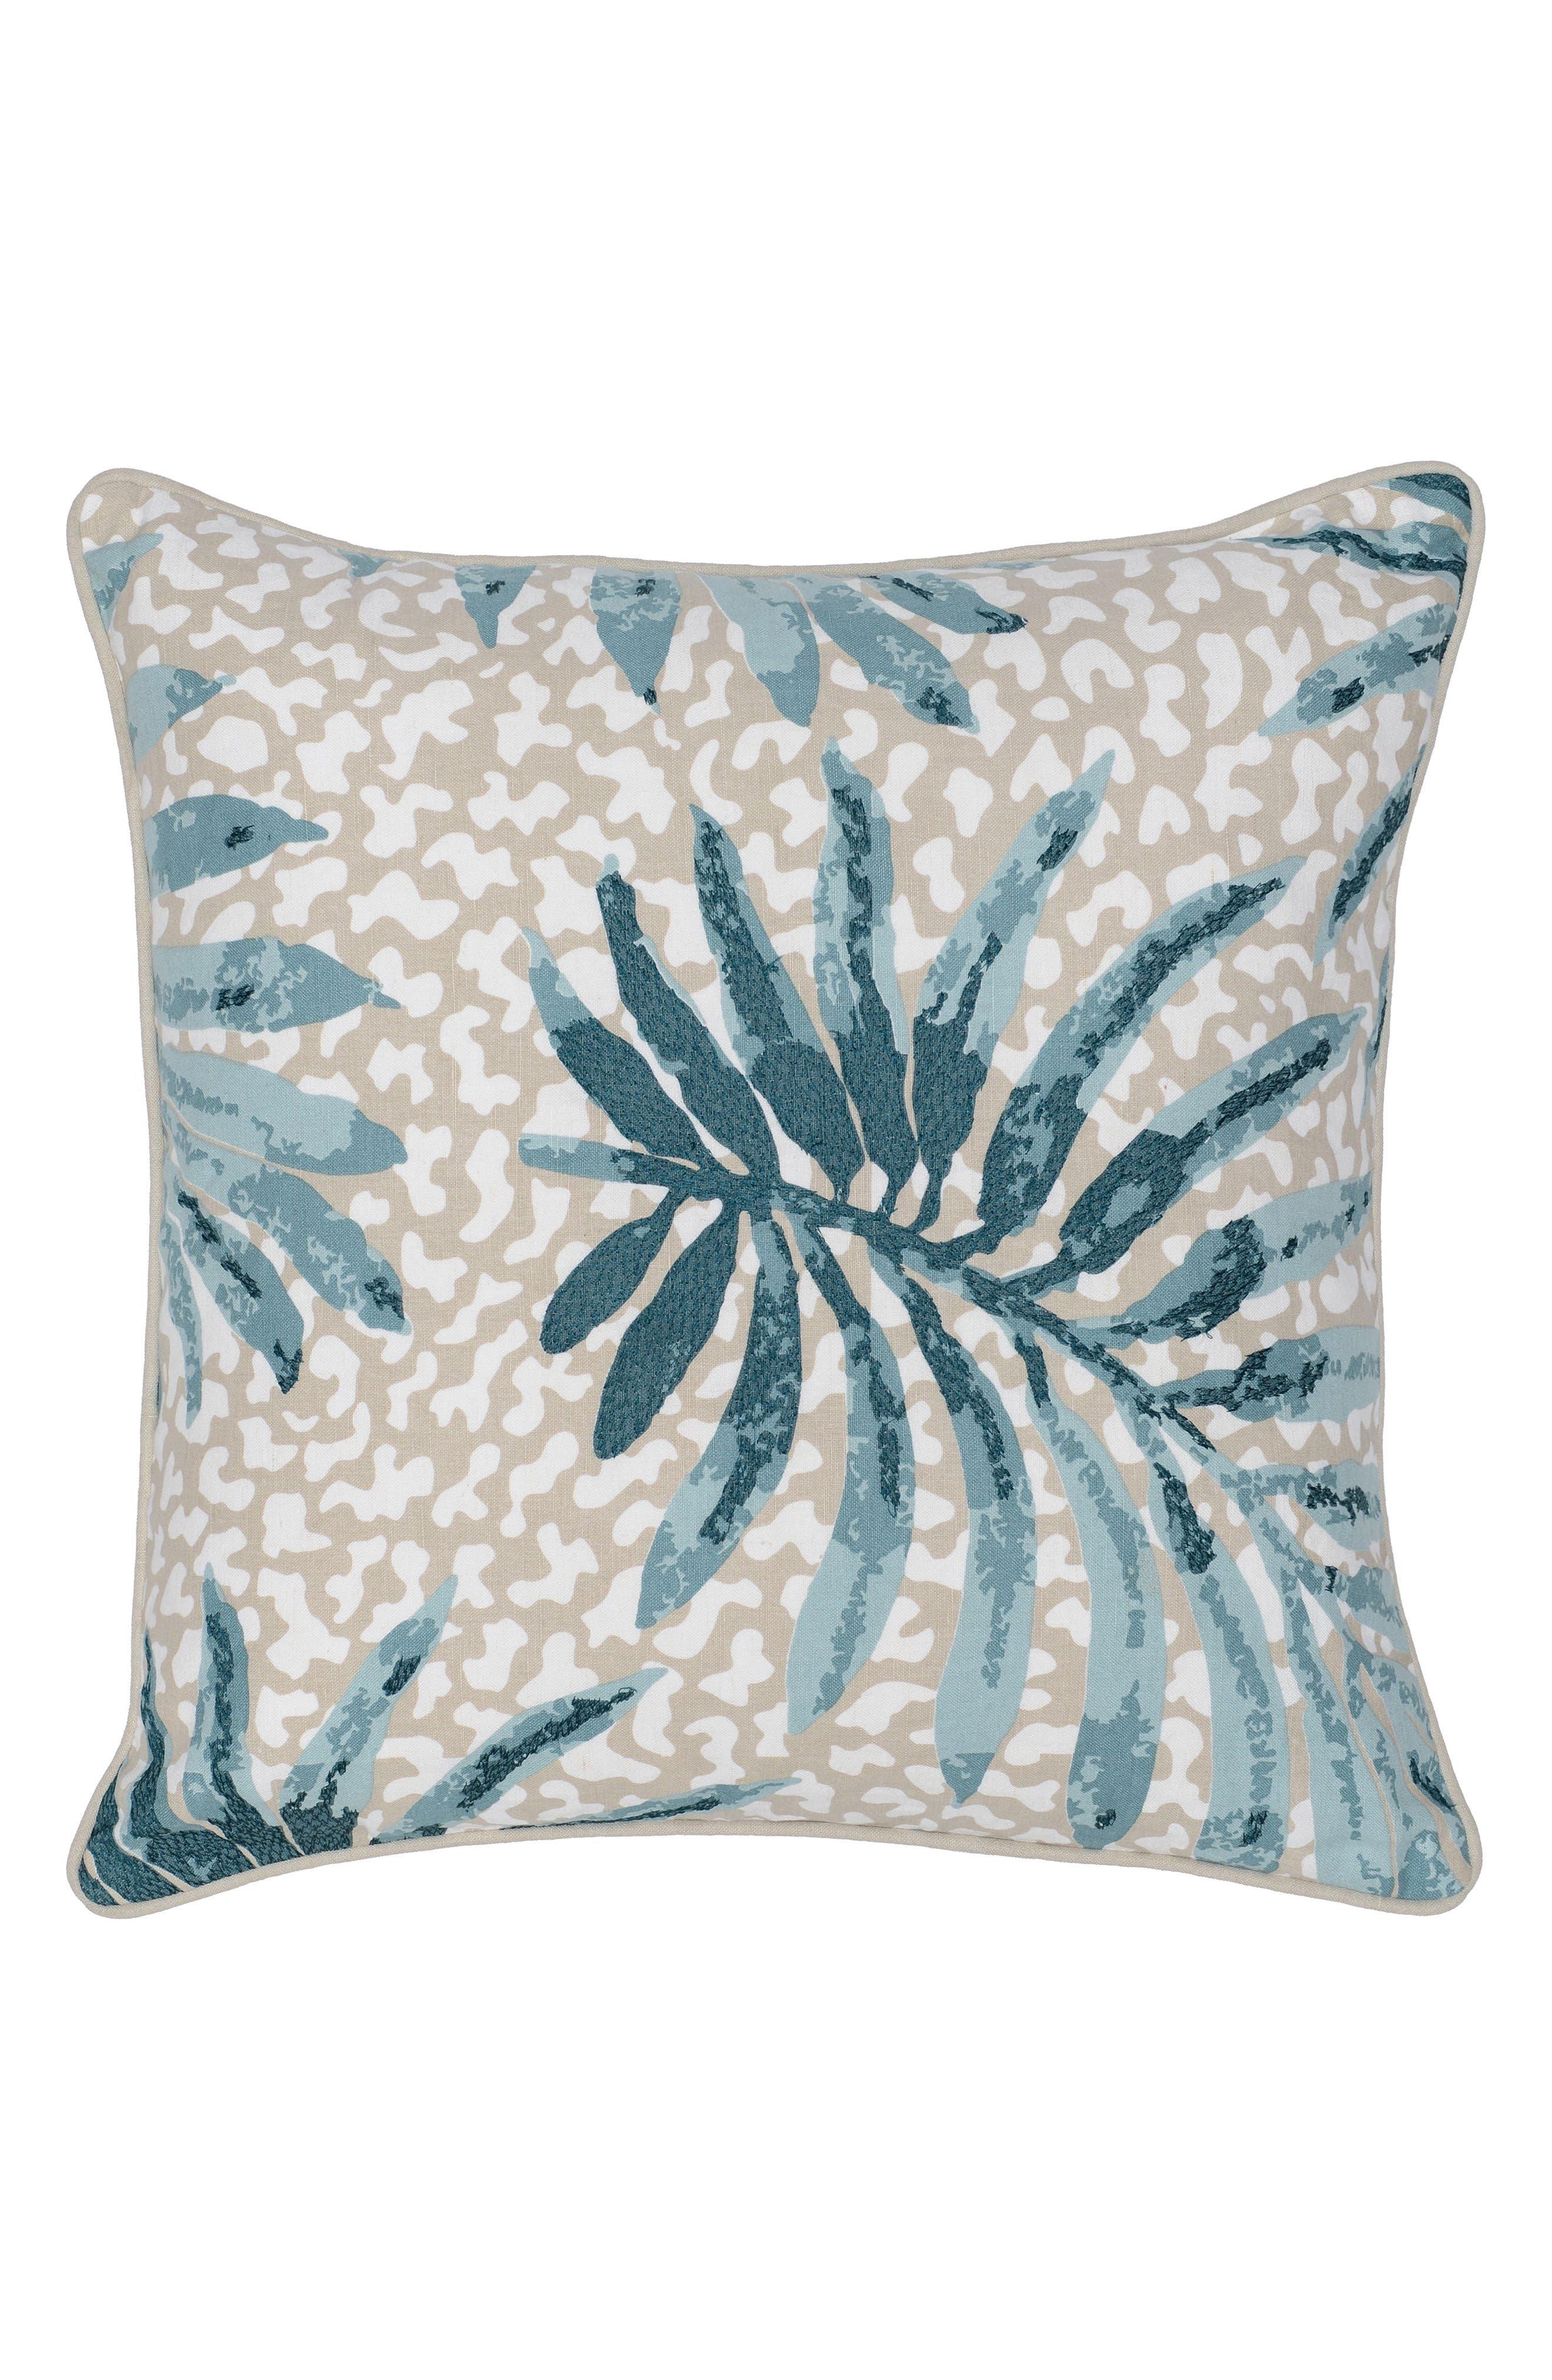 Cobi Pillow,                             Main thumbnail 1, color,                             Beige/ Teal